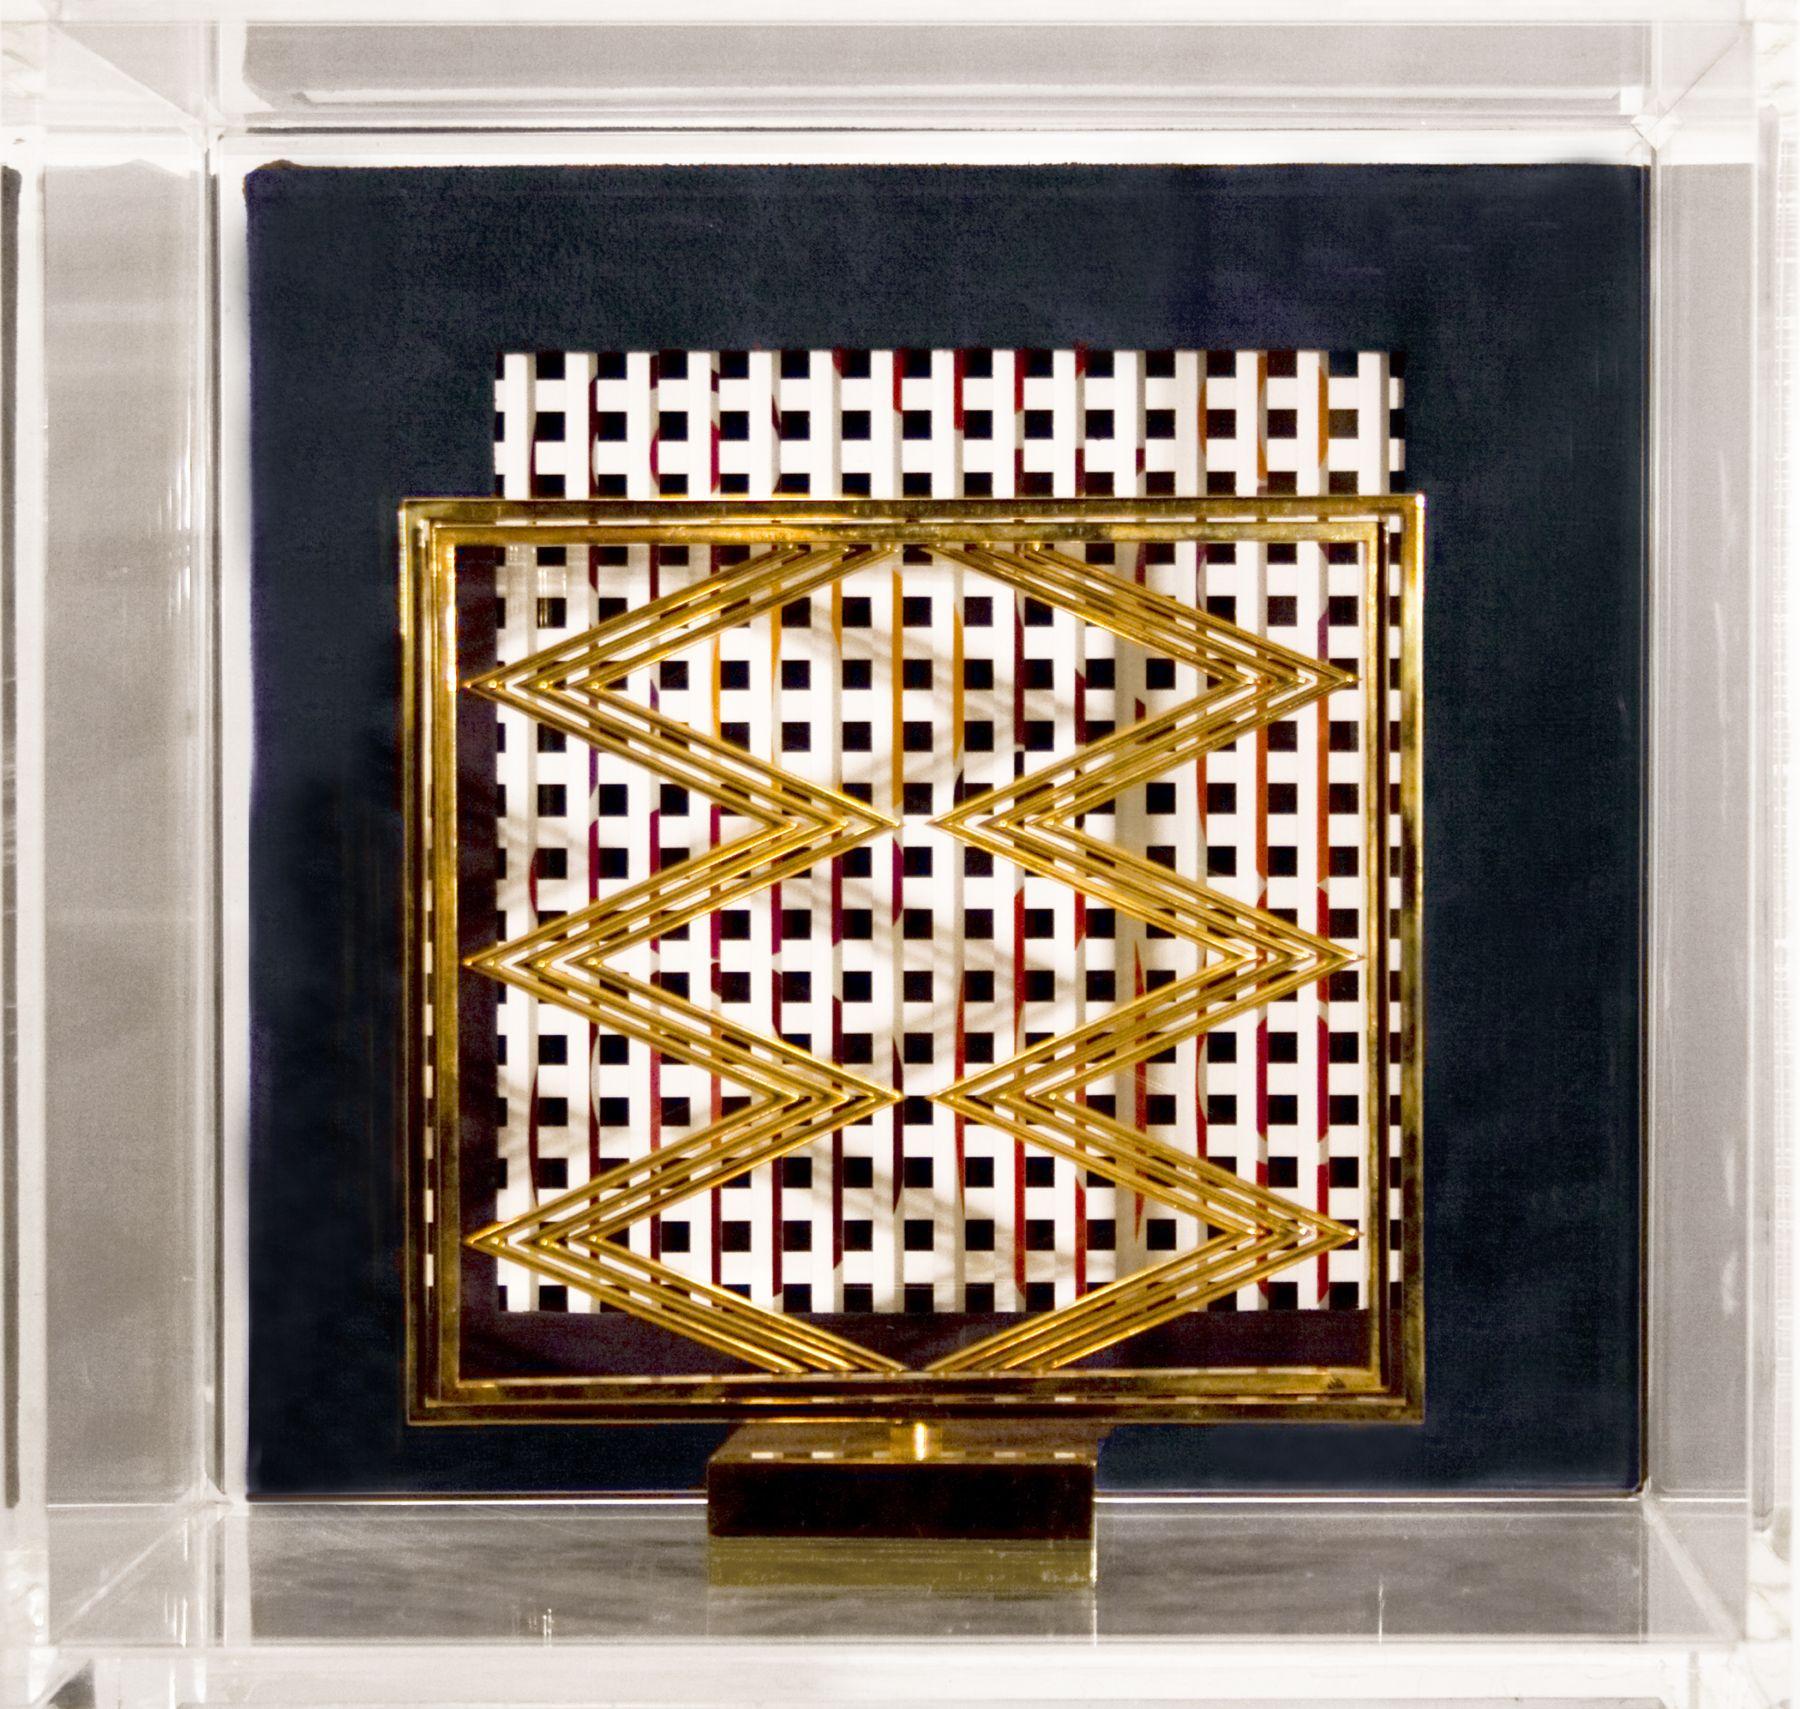 Yaacov Agam, Sens presence sens (SOLD), c.1976, polished bronze in Plexi case with book, sculpture: 8 x 8 x 8 inches, Plexi: 12 x 12 x 13 inches